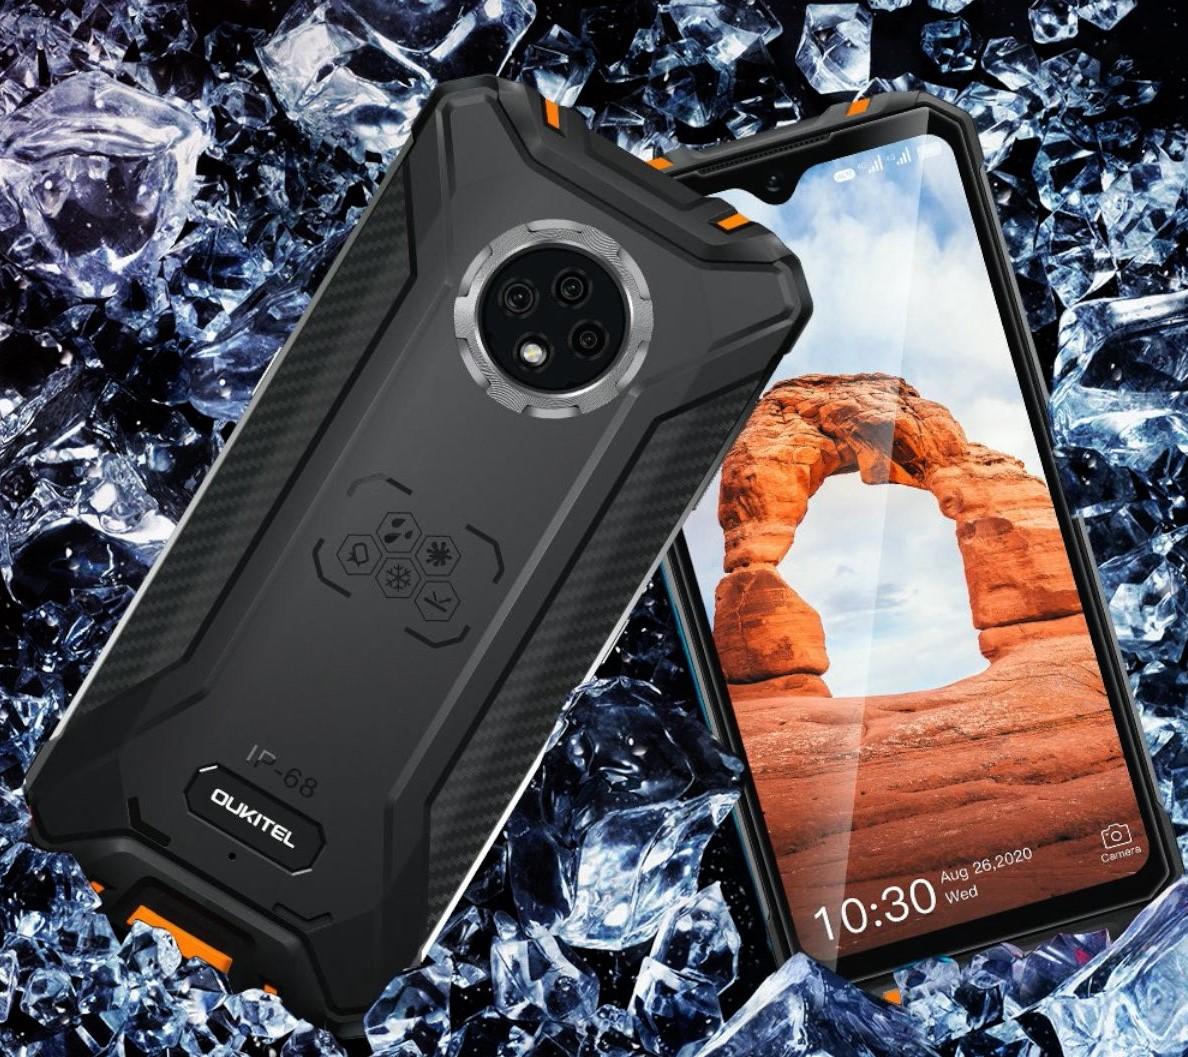 Oukitel WP8 Pro Rugged Phone Bangladesh